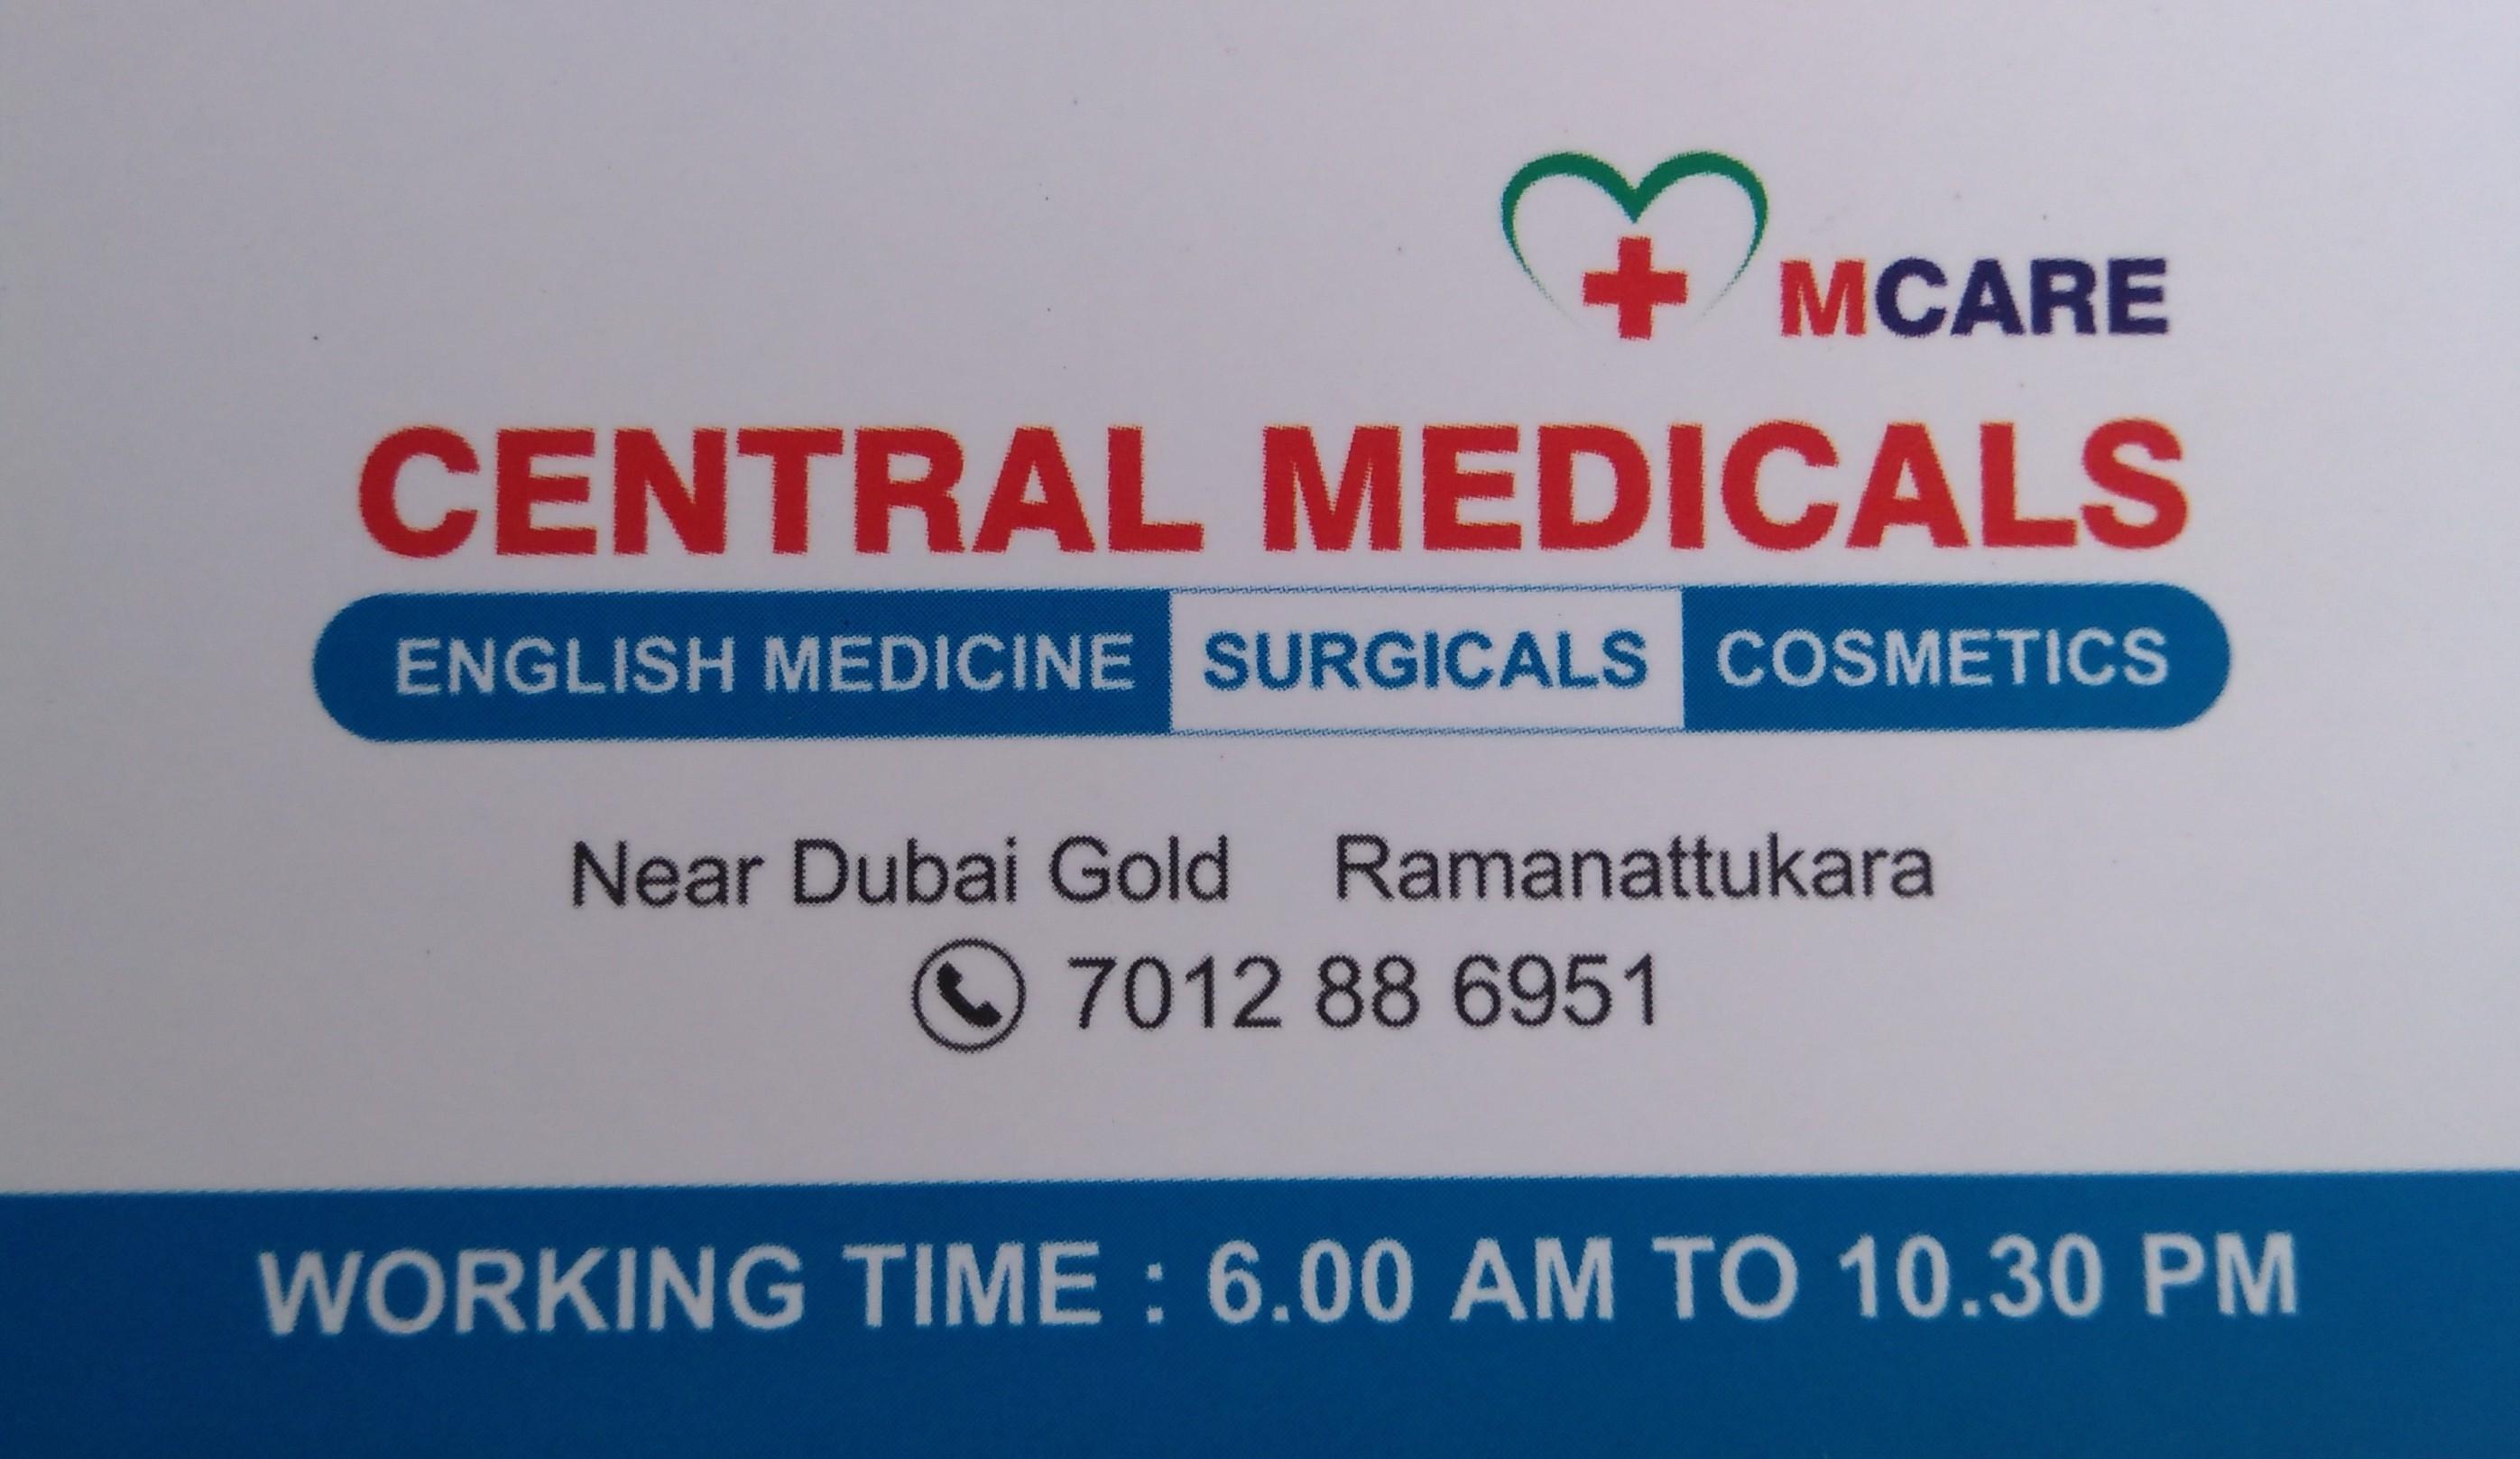 CENTRAL MEDICALS, MEDICAL SHOP,  service in Ramanattukara, Kozhikode